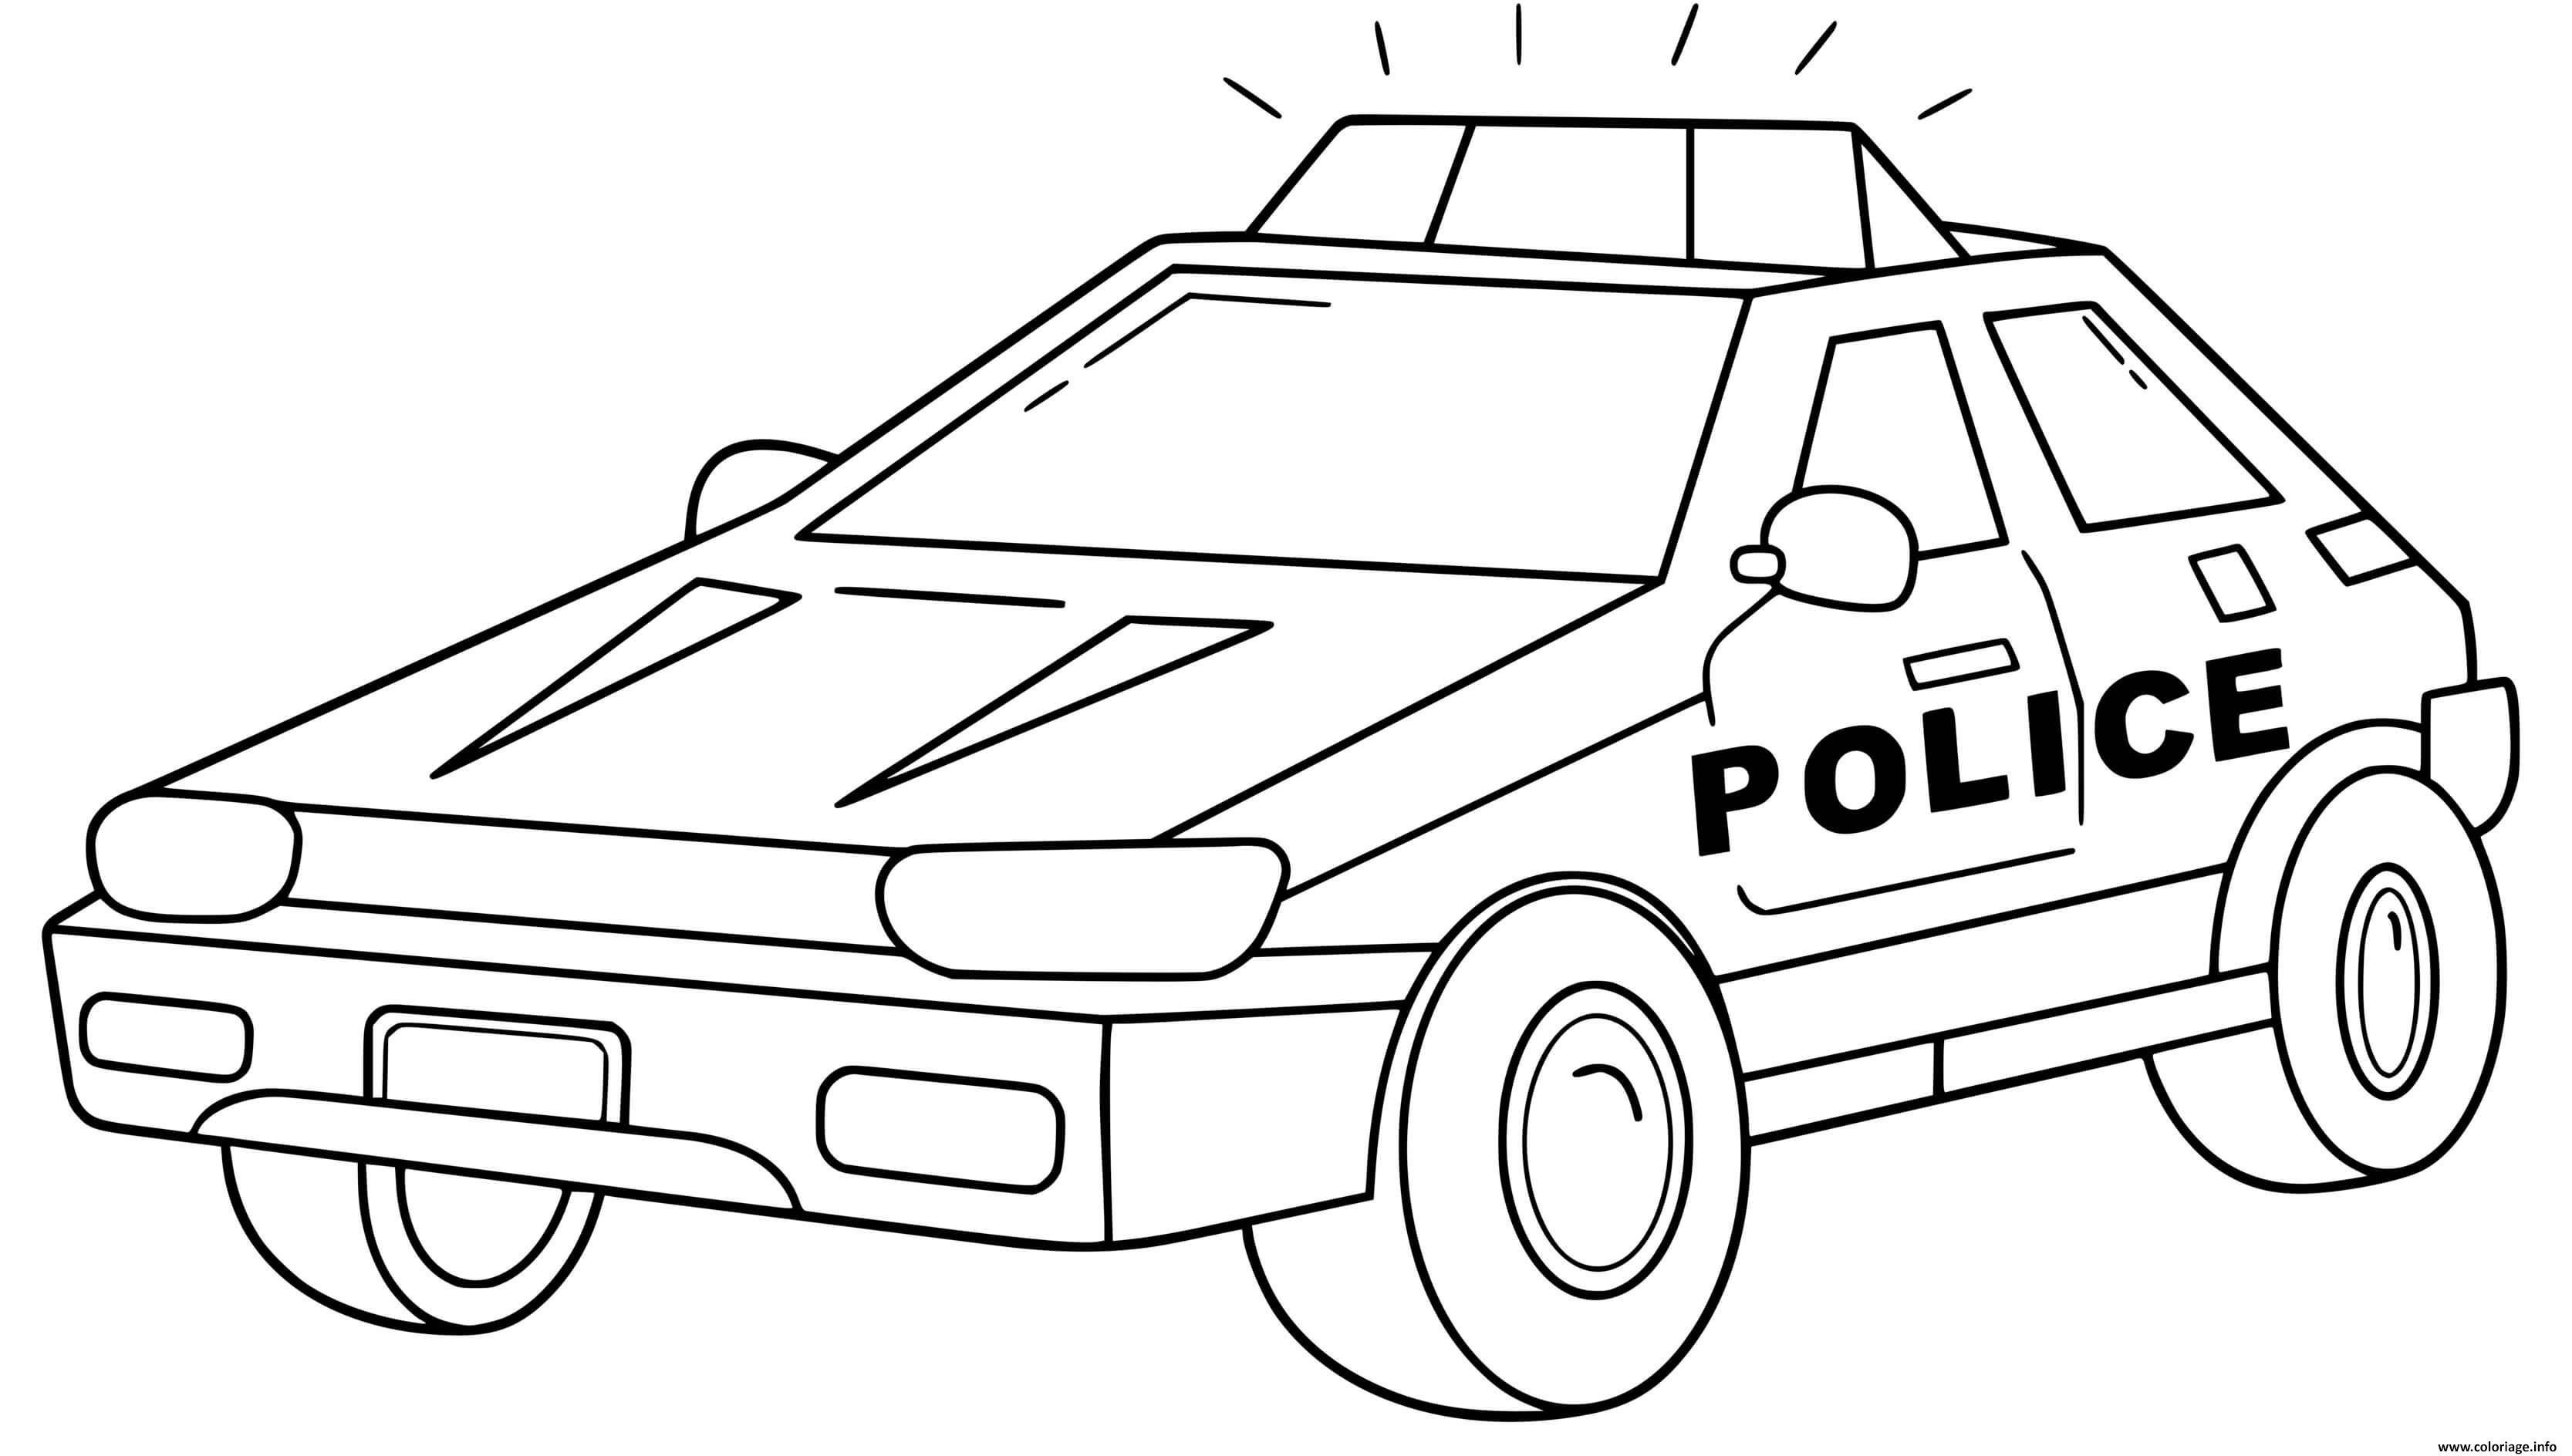 Coloriage Transport Voiture De Police Style Carre Dessin Voiture De Police A Imprimer